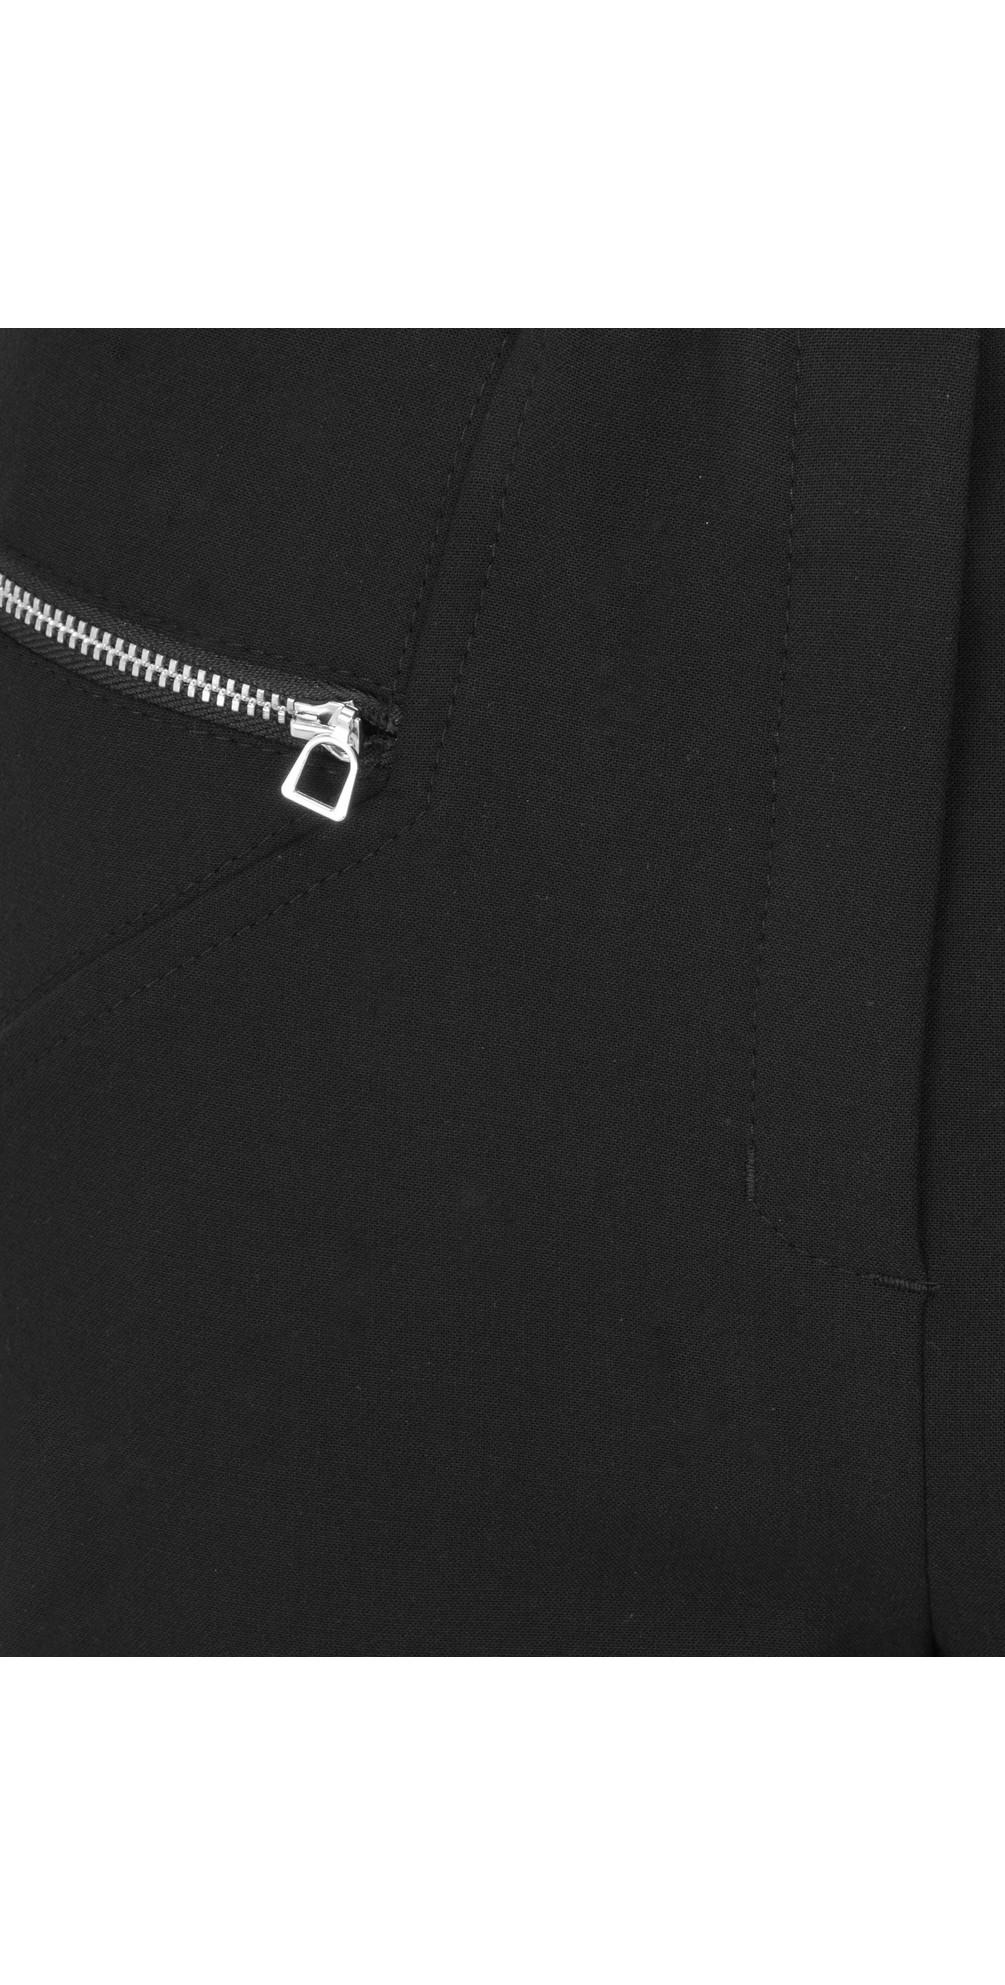 Mimi Plain Full Length Trouser main image